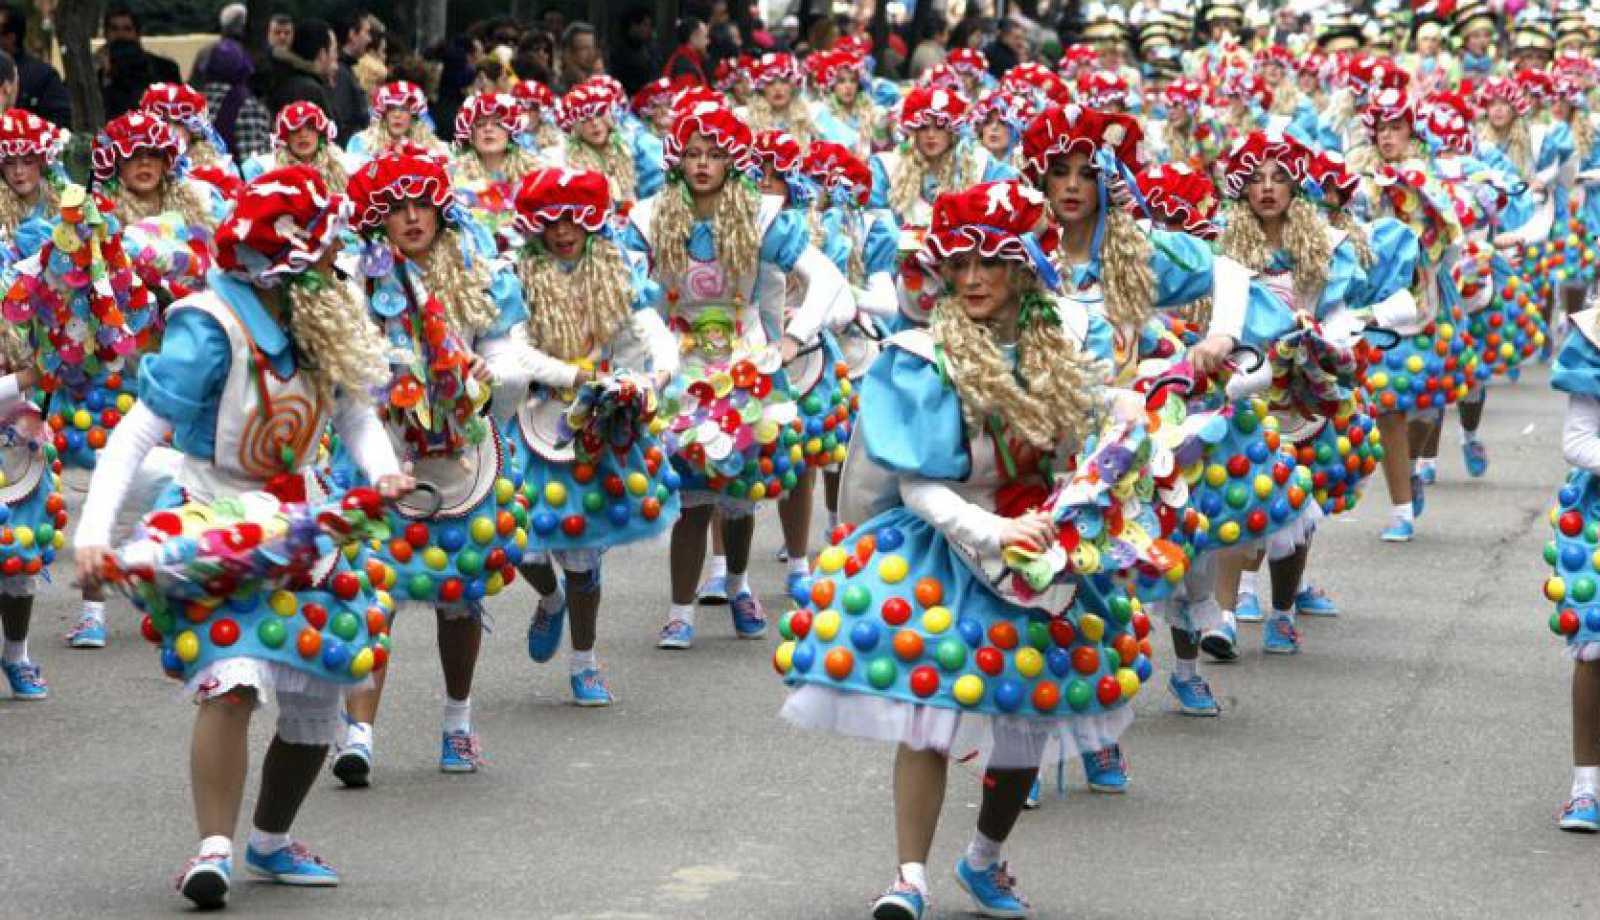 carnaval badajoz interes turistico nacional